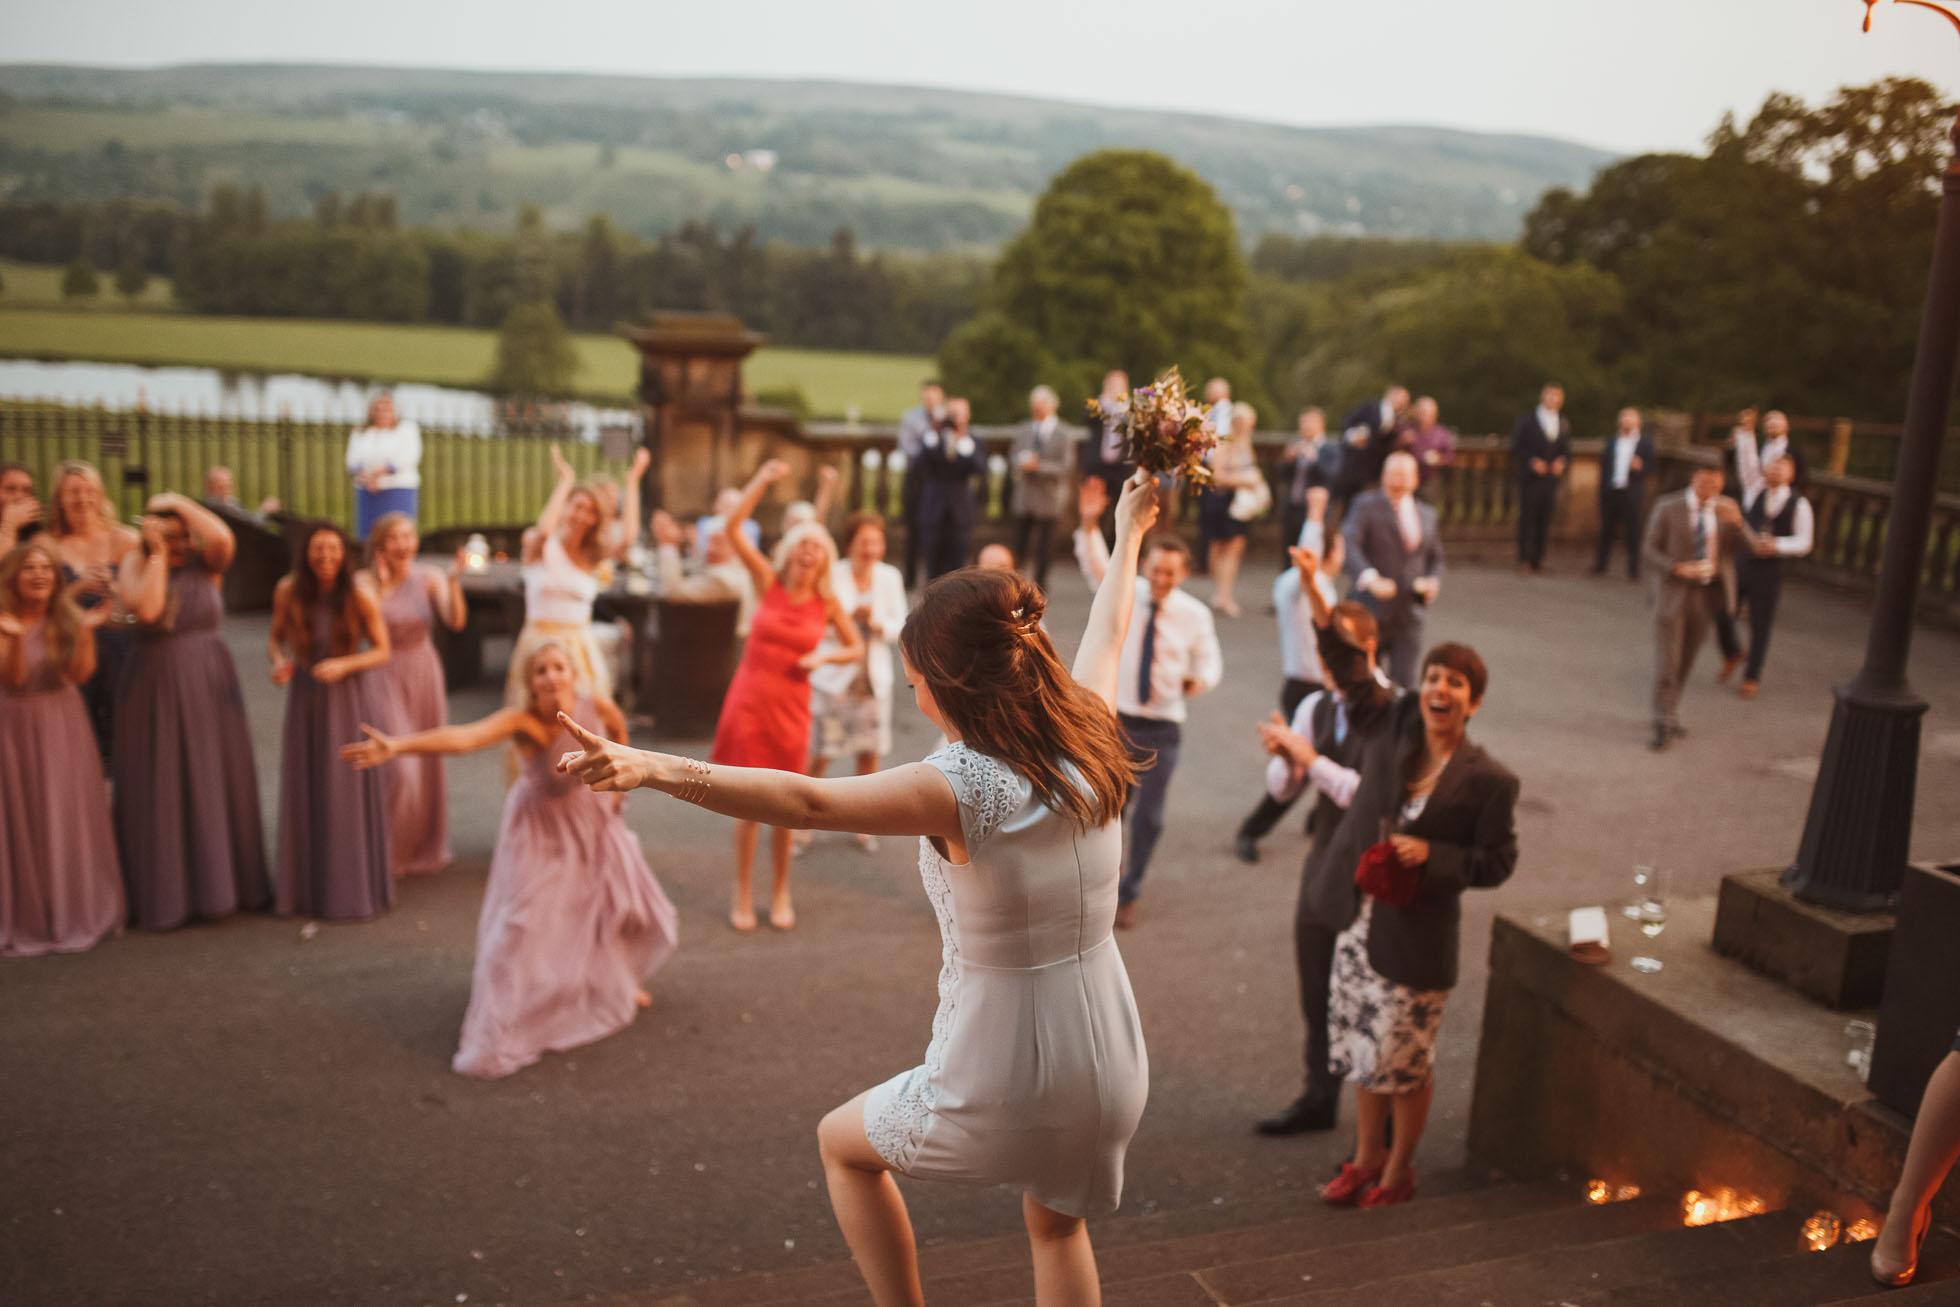 denton-hall-wedding-photographer-79.jpg